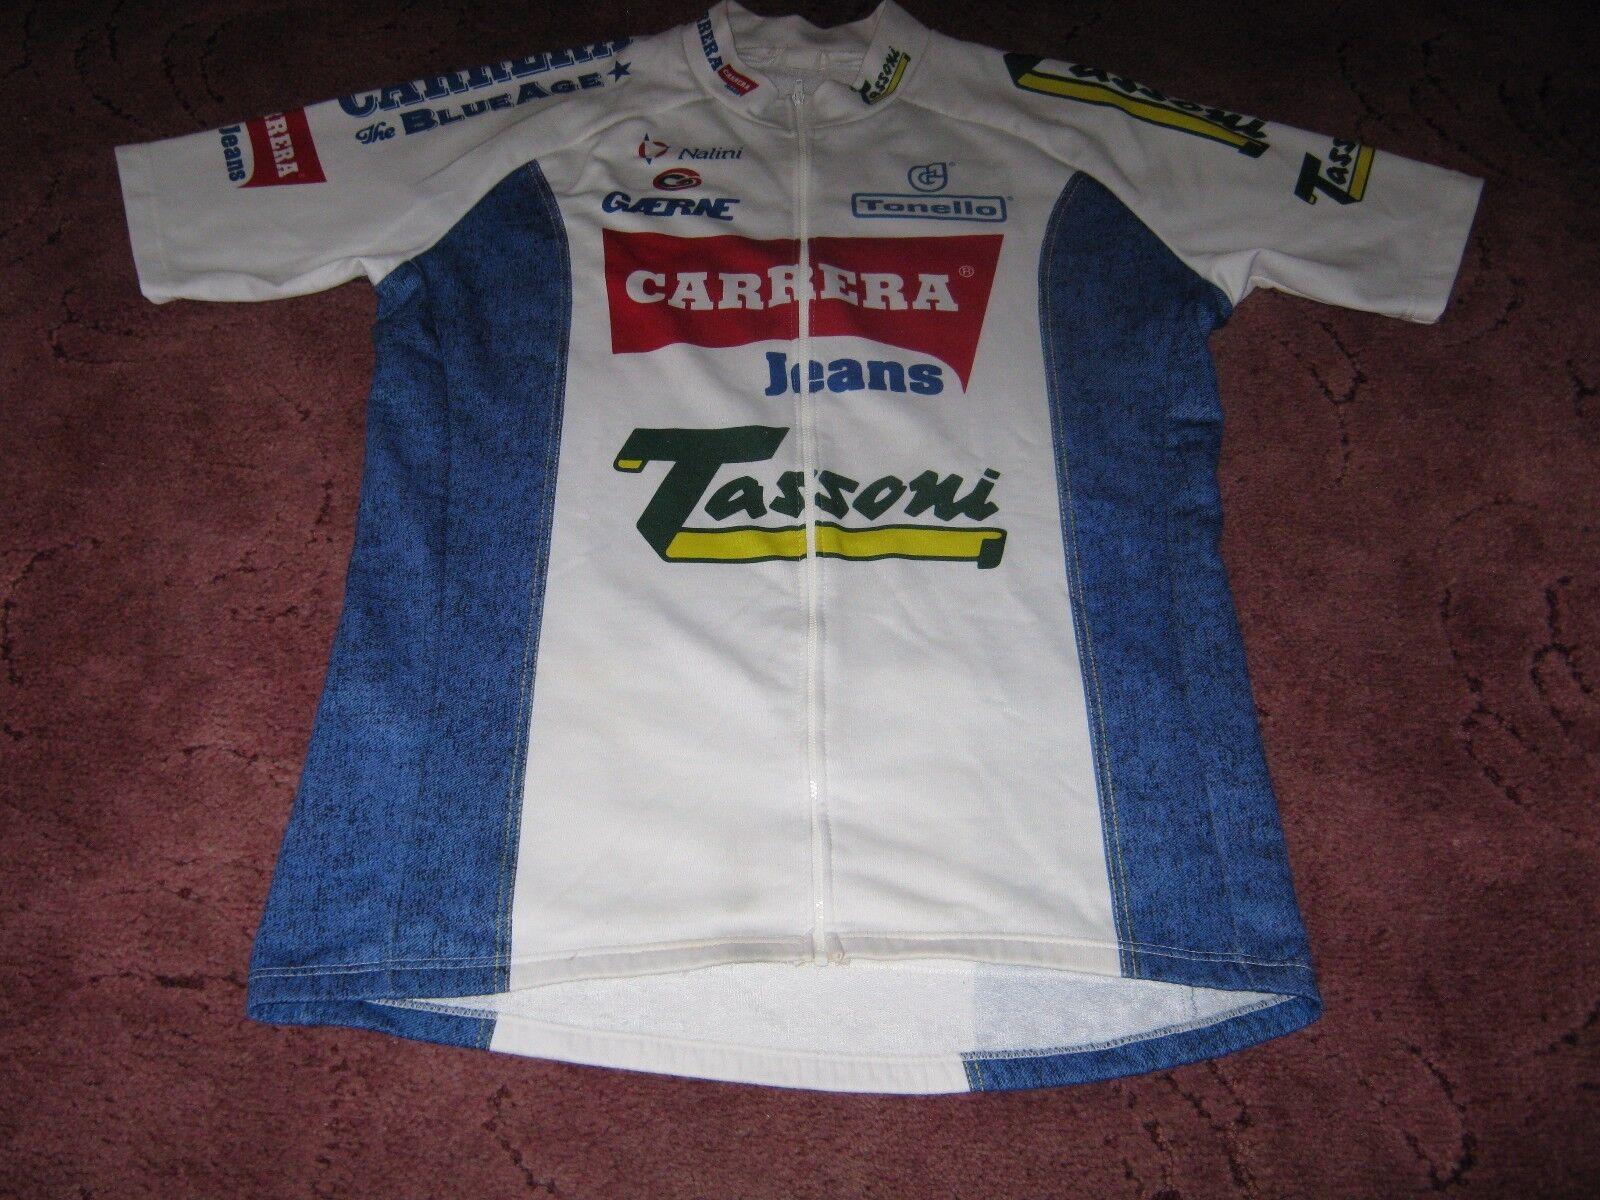 CARRERA TASSONI 1994 NALINI ITALIAN VINTAGE CYCLING JERSEY [Sz  7] WITH LONG ZIP